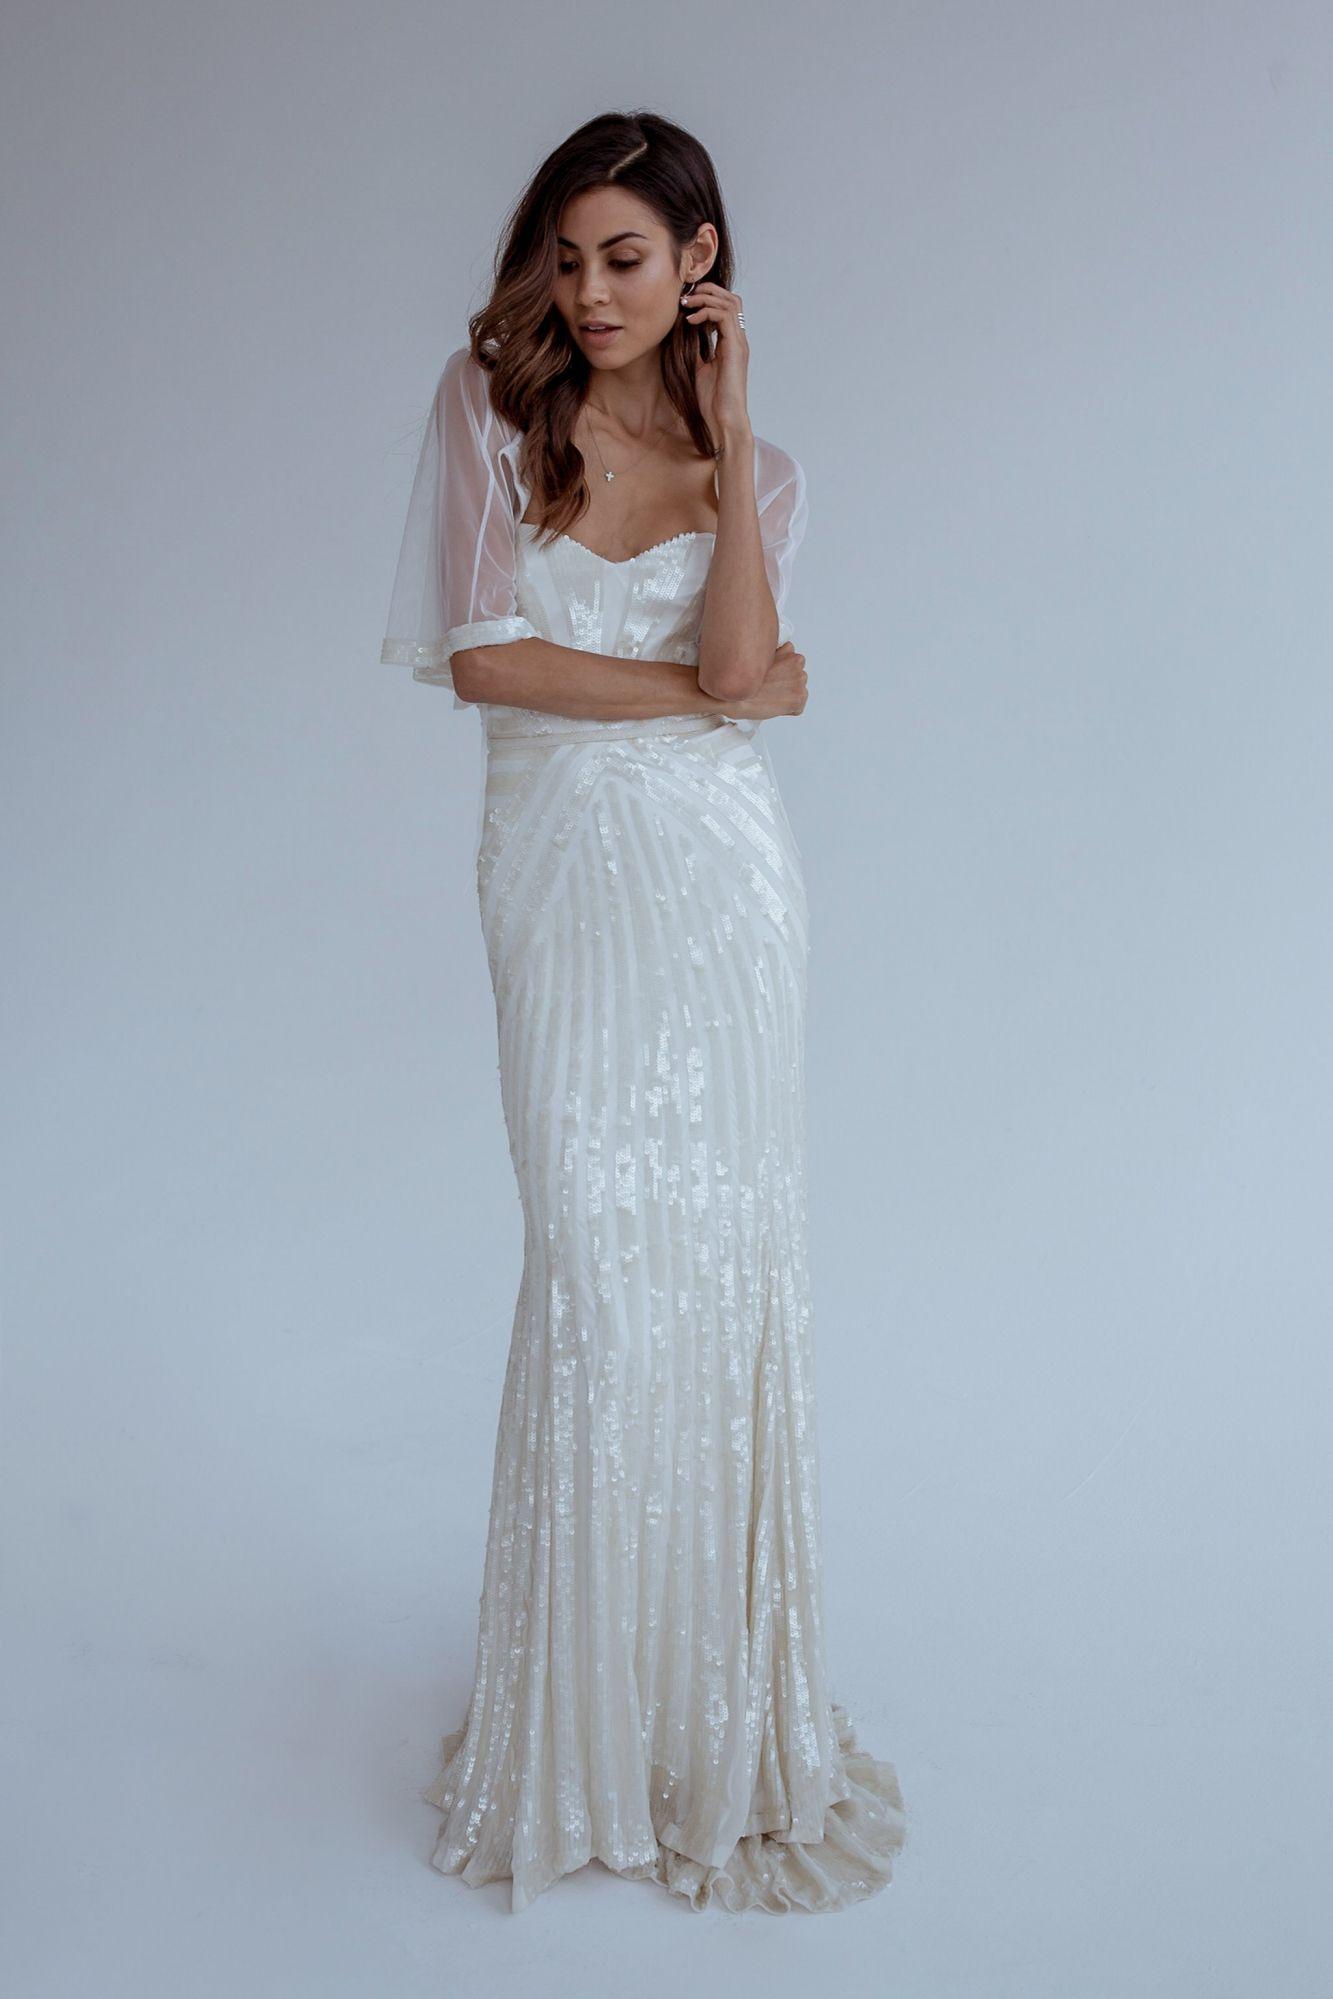 Teal and white wedding dresses  Karen Willis Holmes  Layla  Wedding dresses of   Pinterest